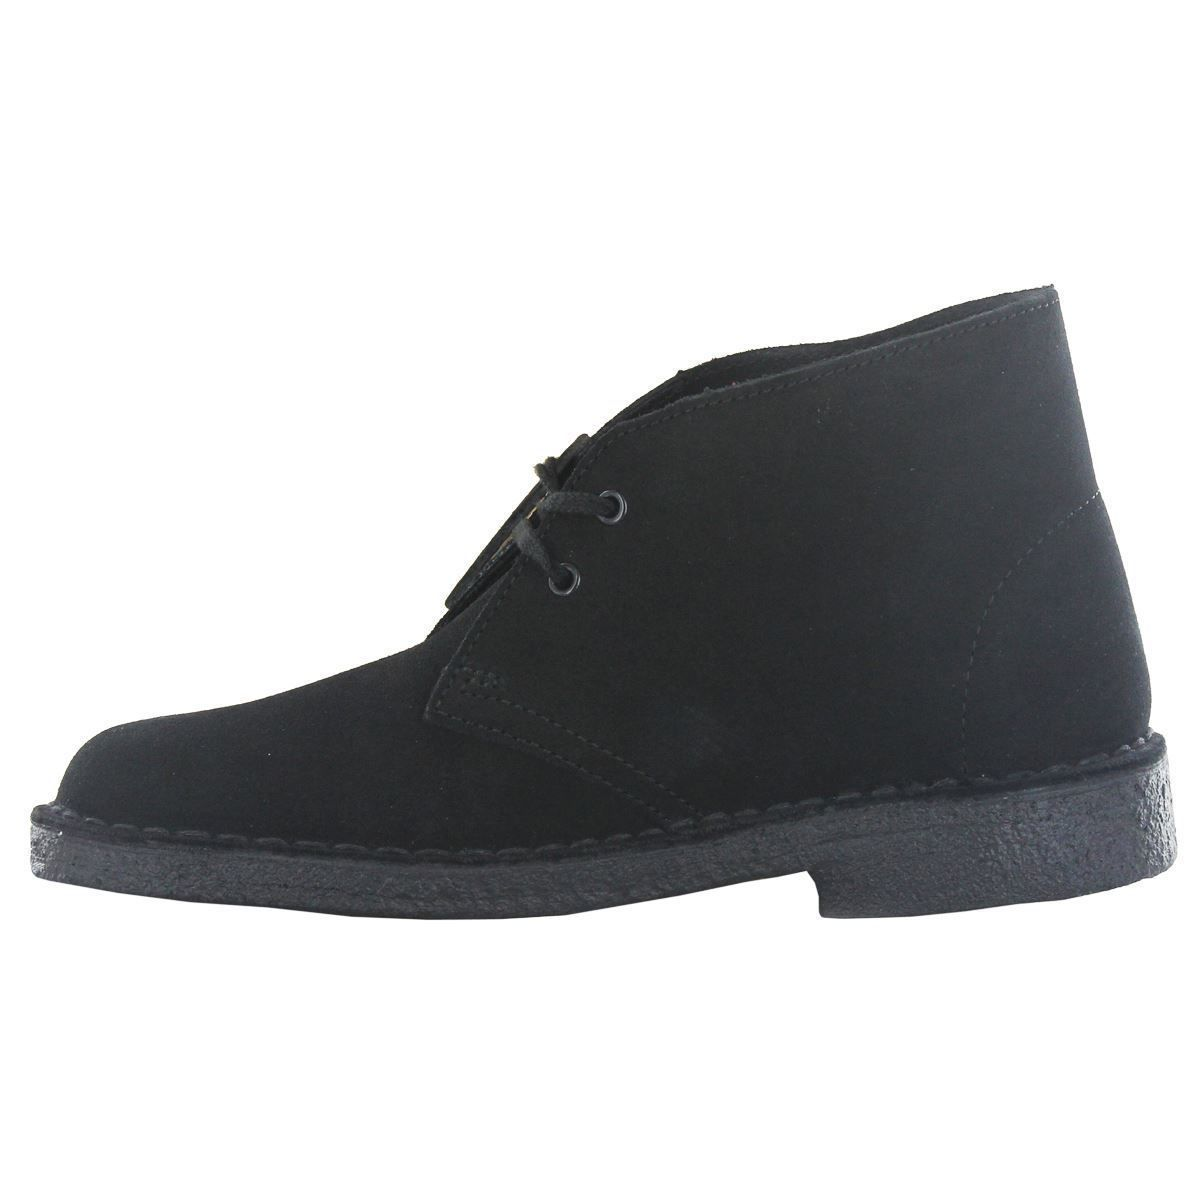 clarks originals sale mens desert boot black lace up